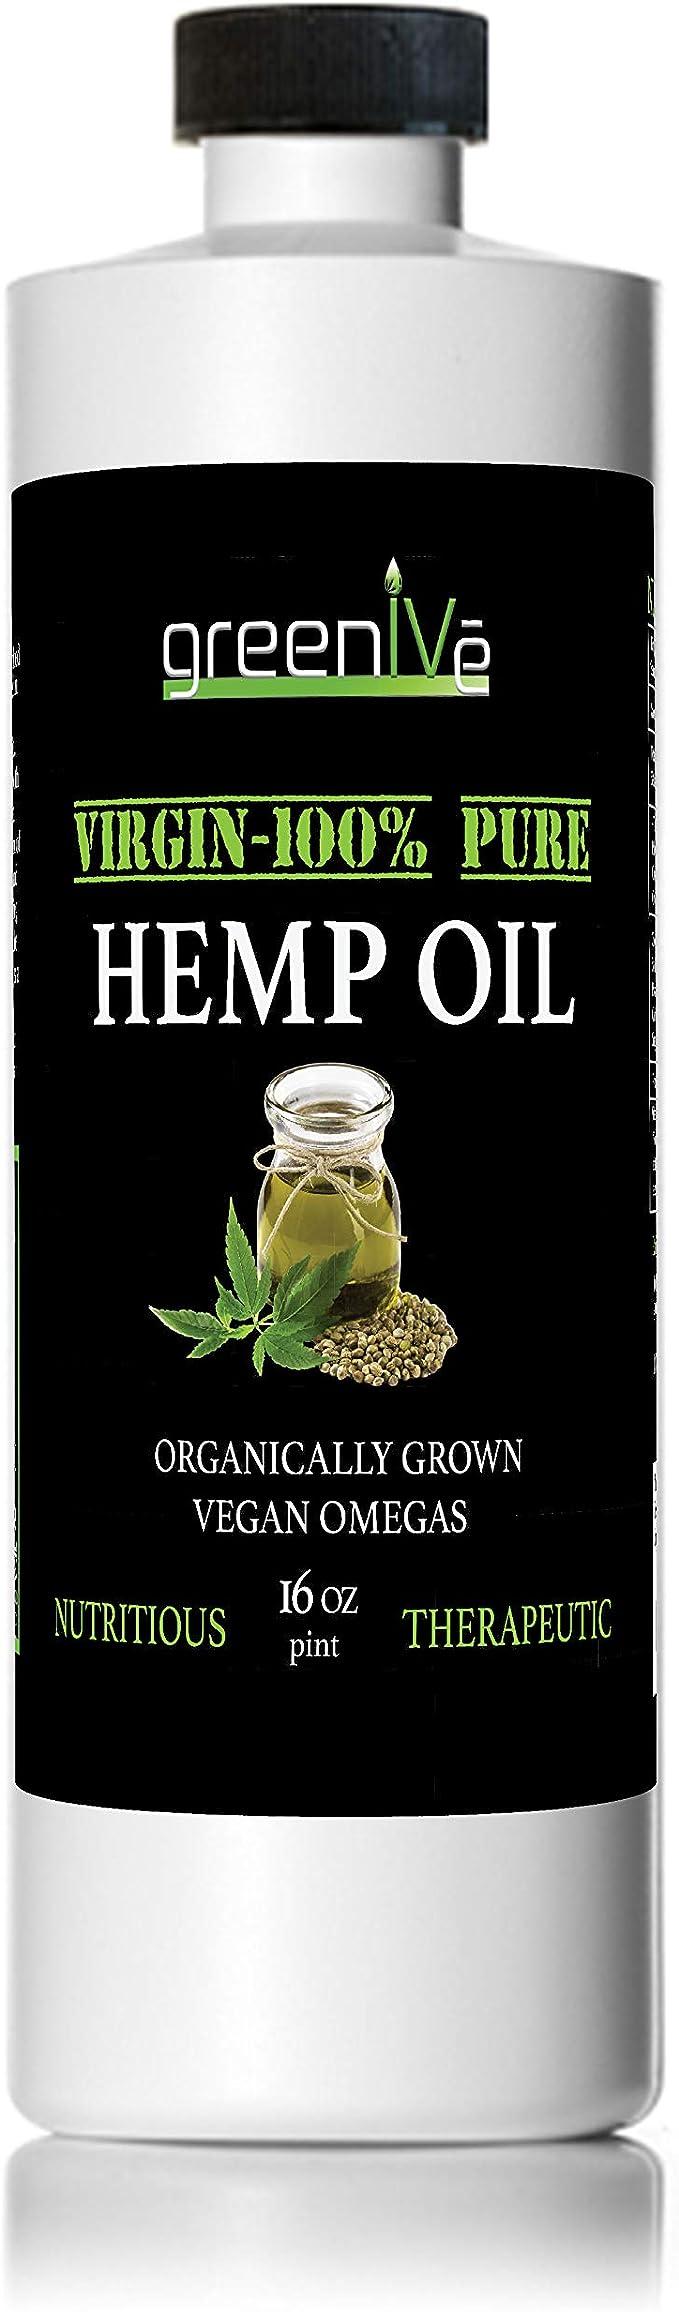 GreenIVe Vegan Hemp Oil